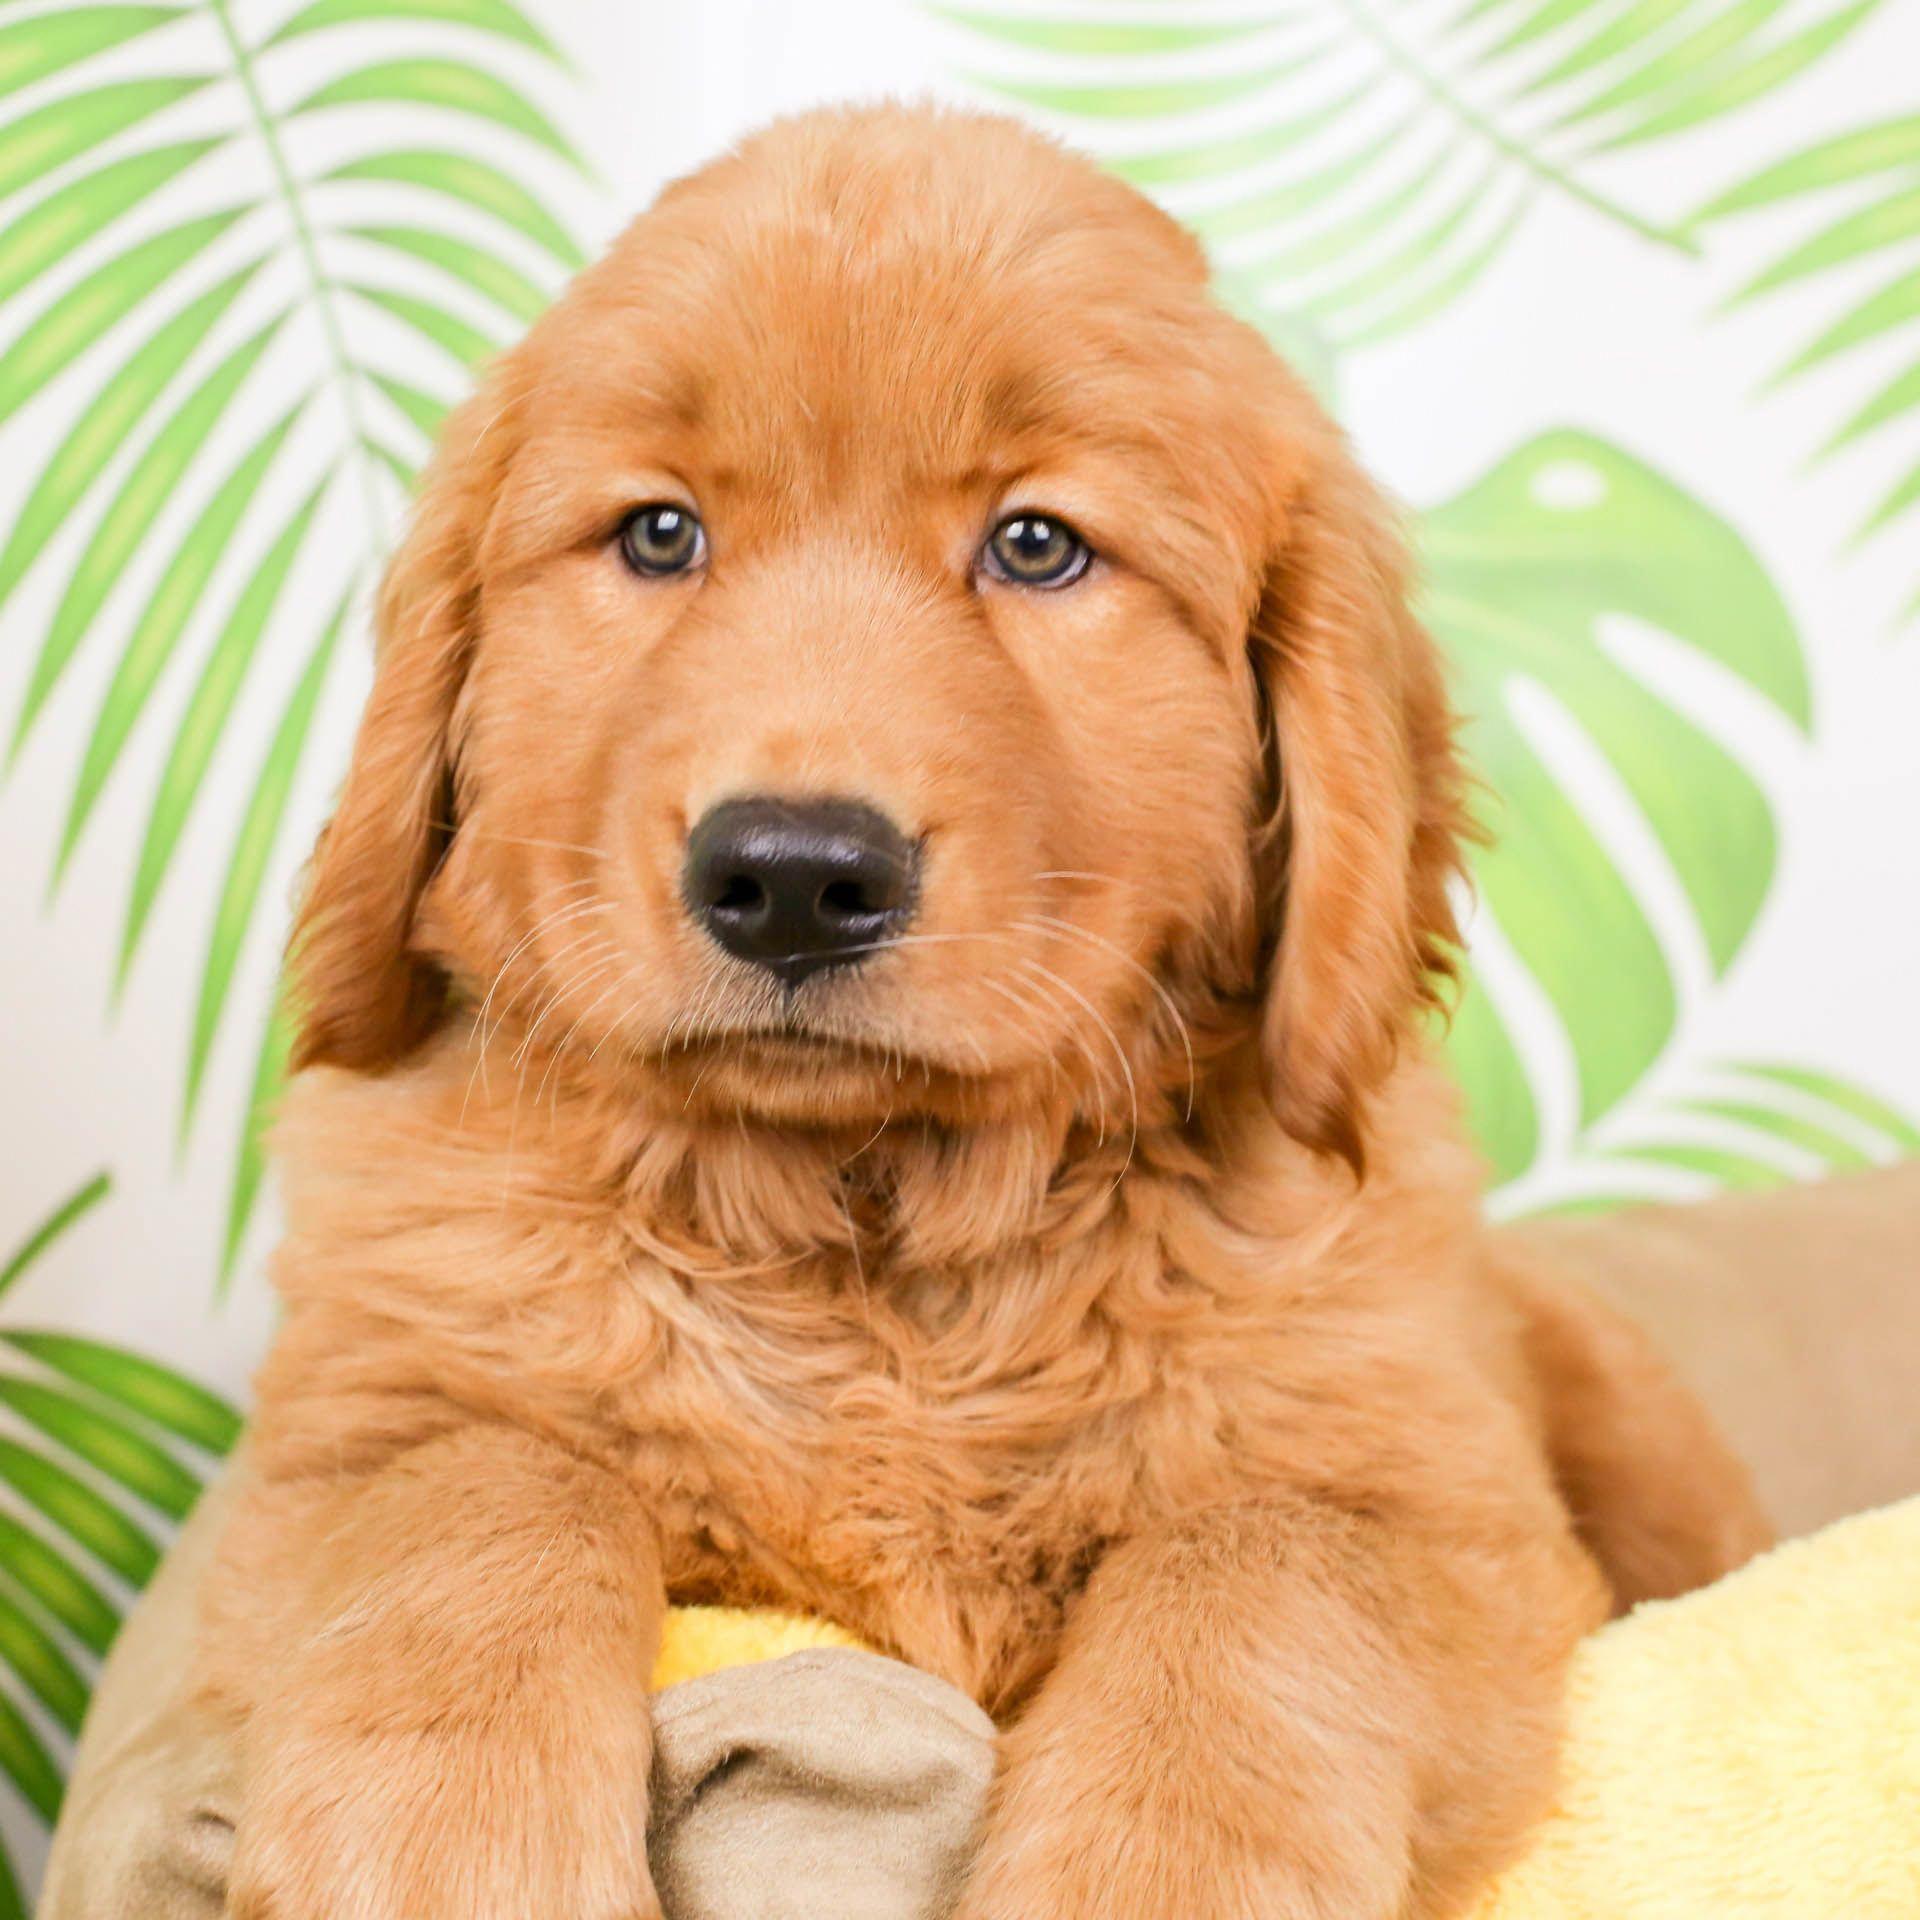 Golden Retriever Puppies For Sale Near Me 2020